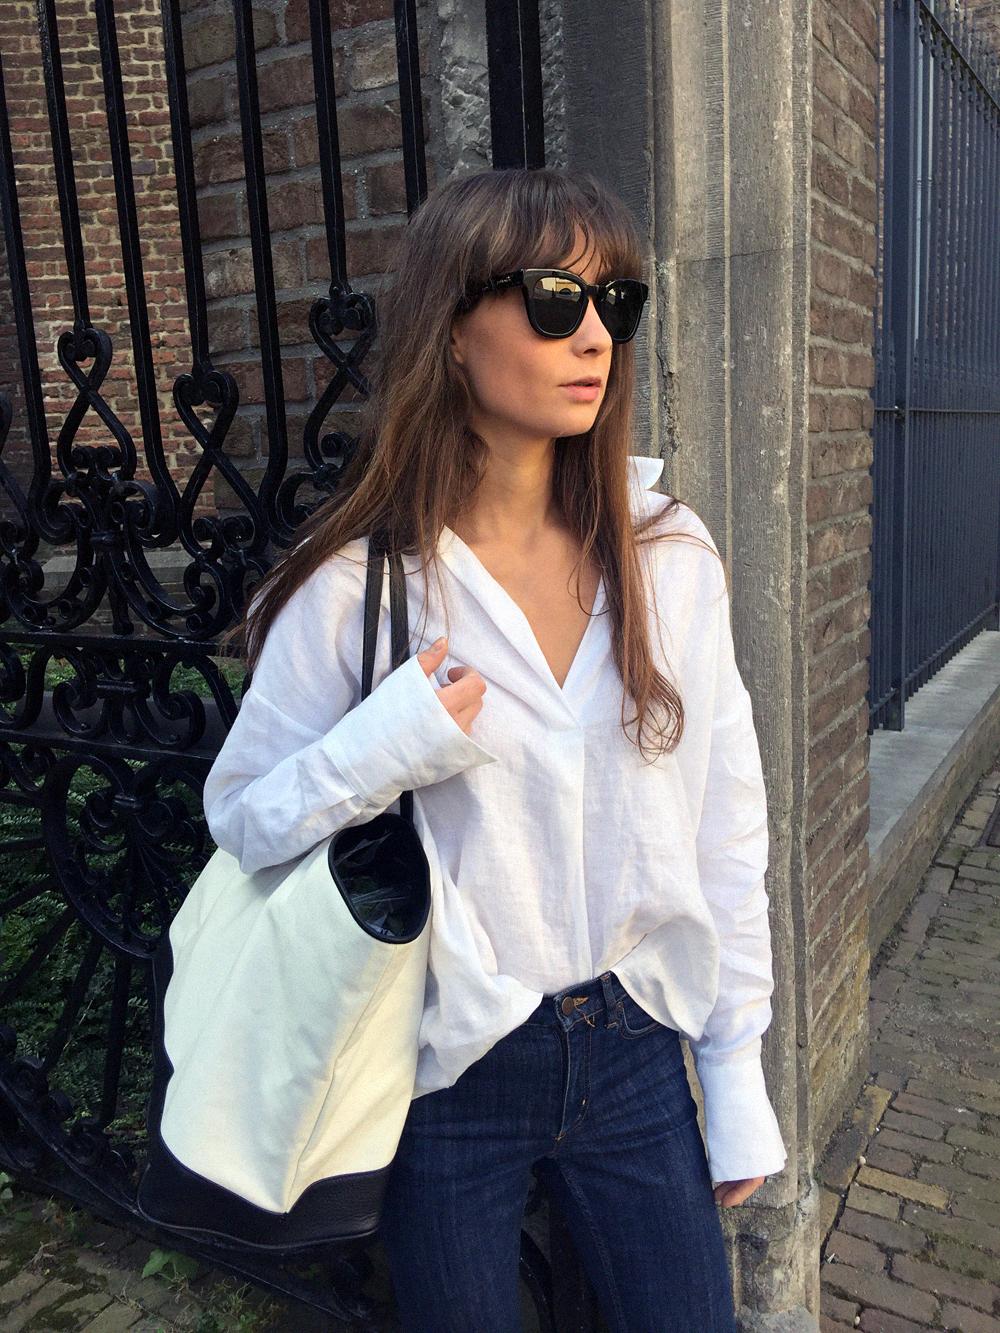 Givenchy sunnies - Zara shirt - COS denim - Haus of Mana bag - Gucci Loafer. 3.png